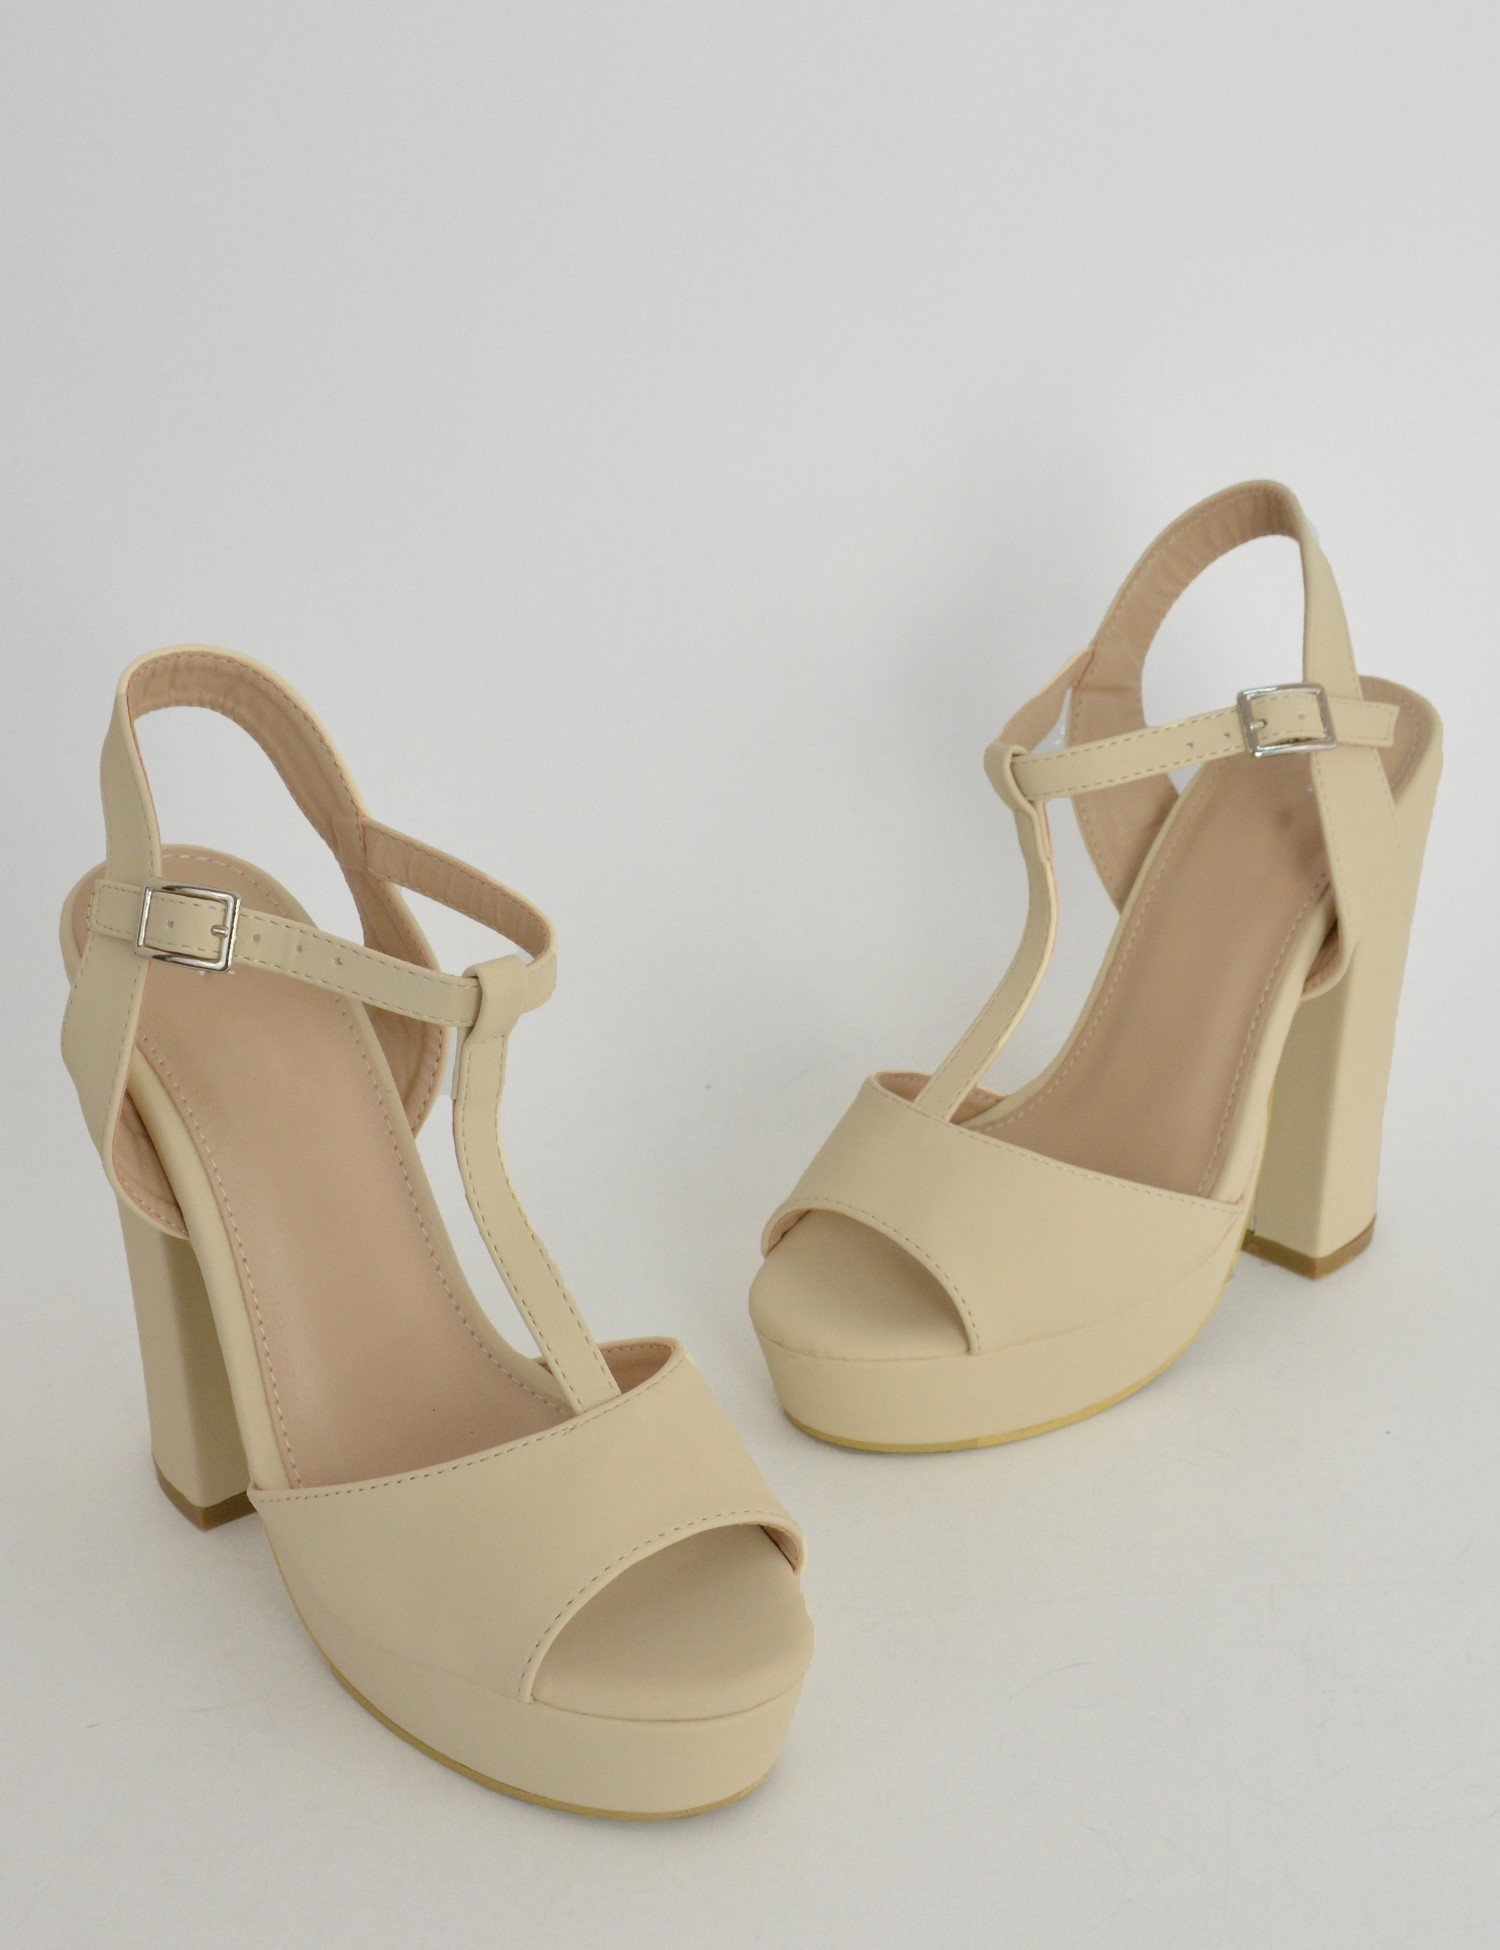 1c86a2f52ea Γυναικεία Παπούτσια, Γυναικεία Πέδιλα